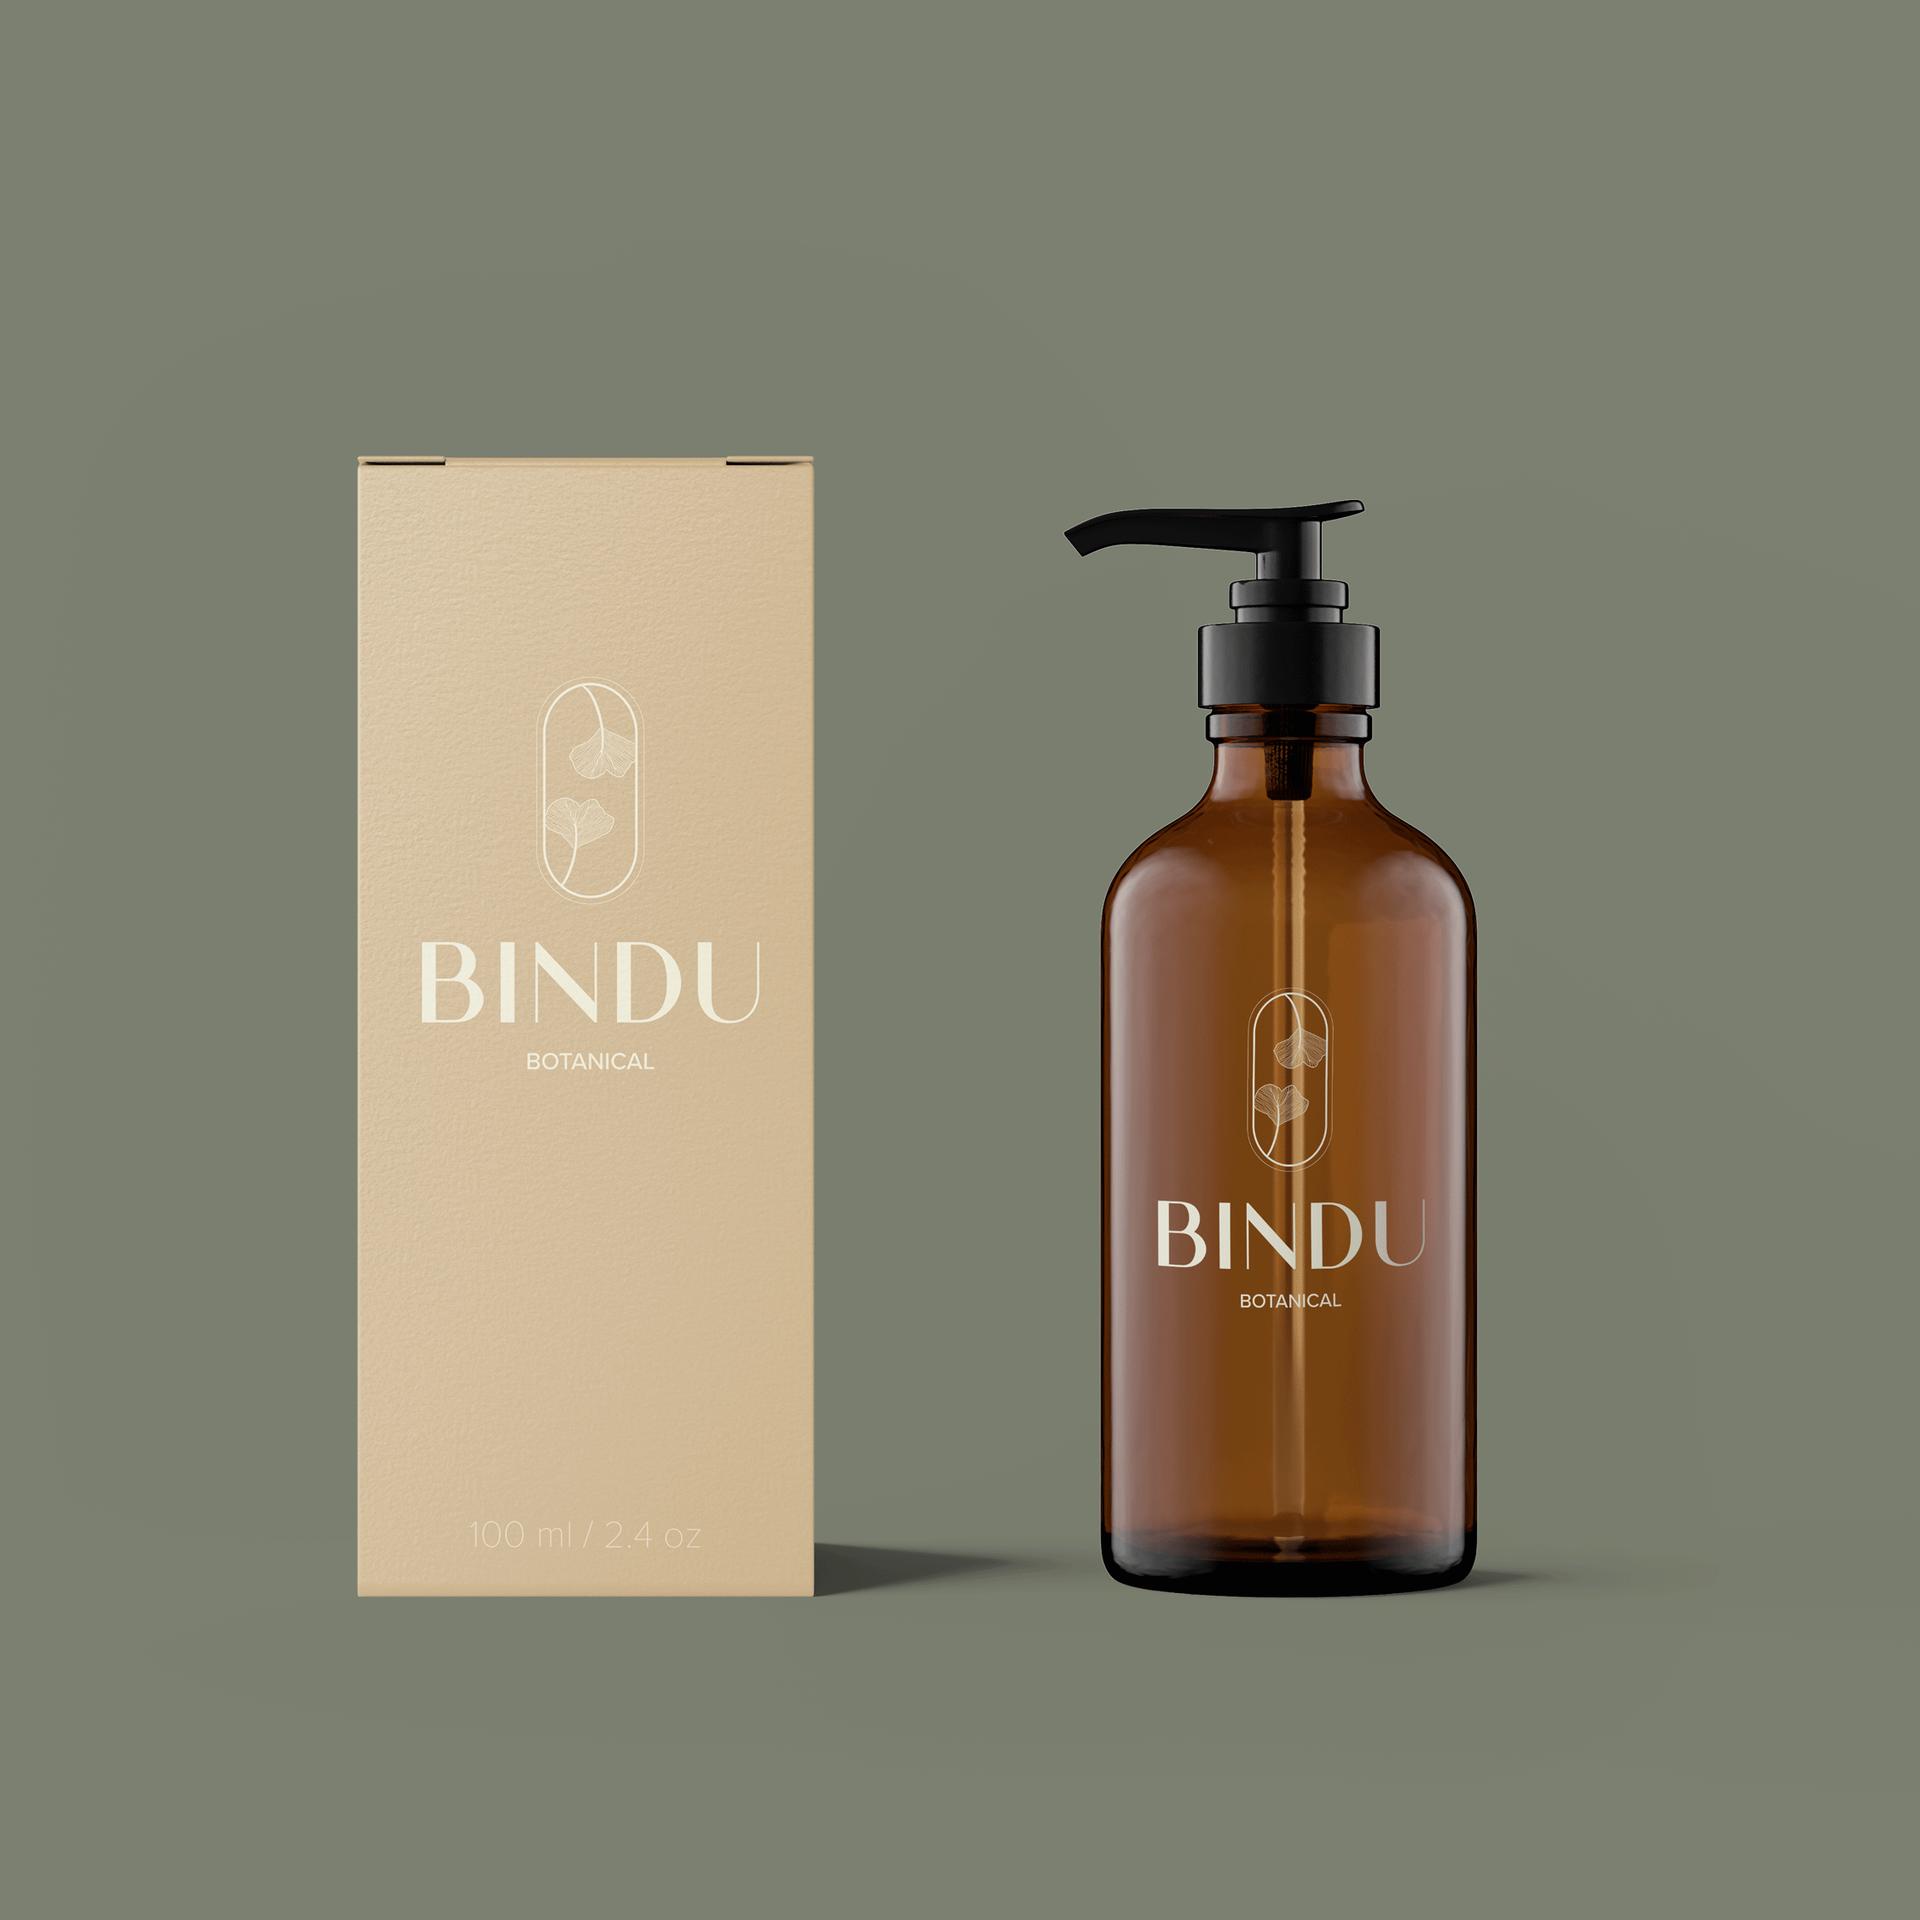 Mockup-bottle_bindu_ATredinick.png